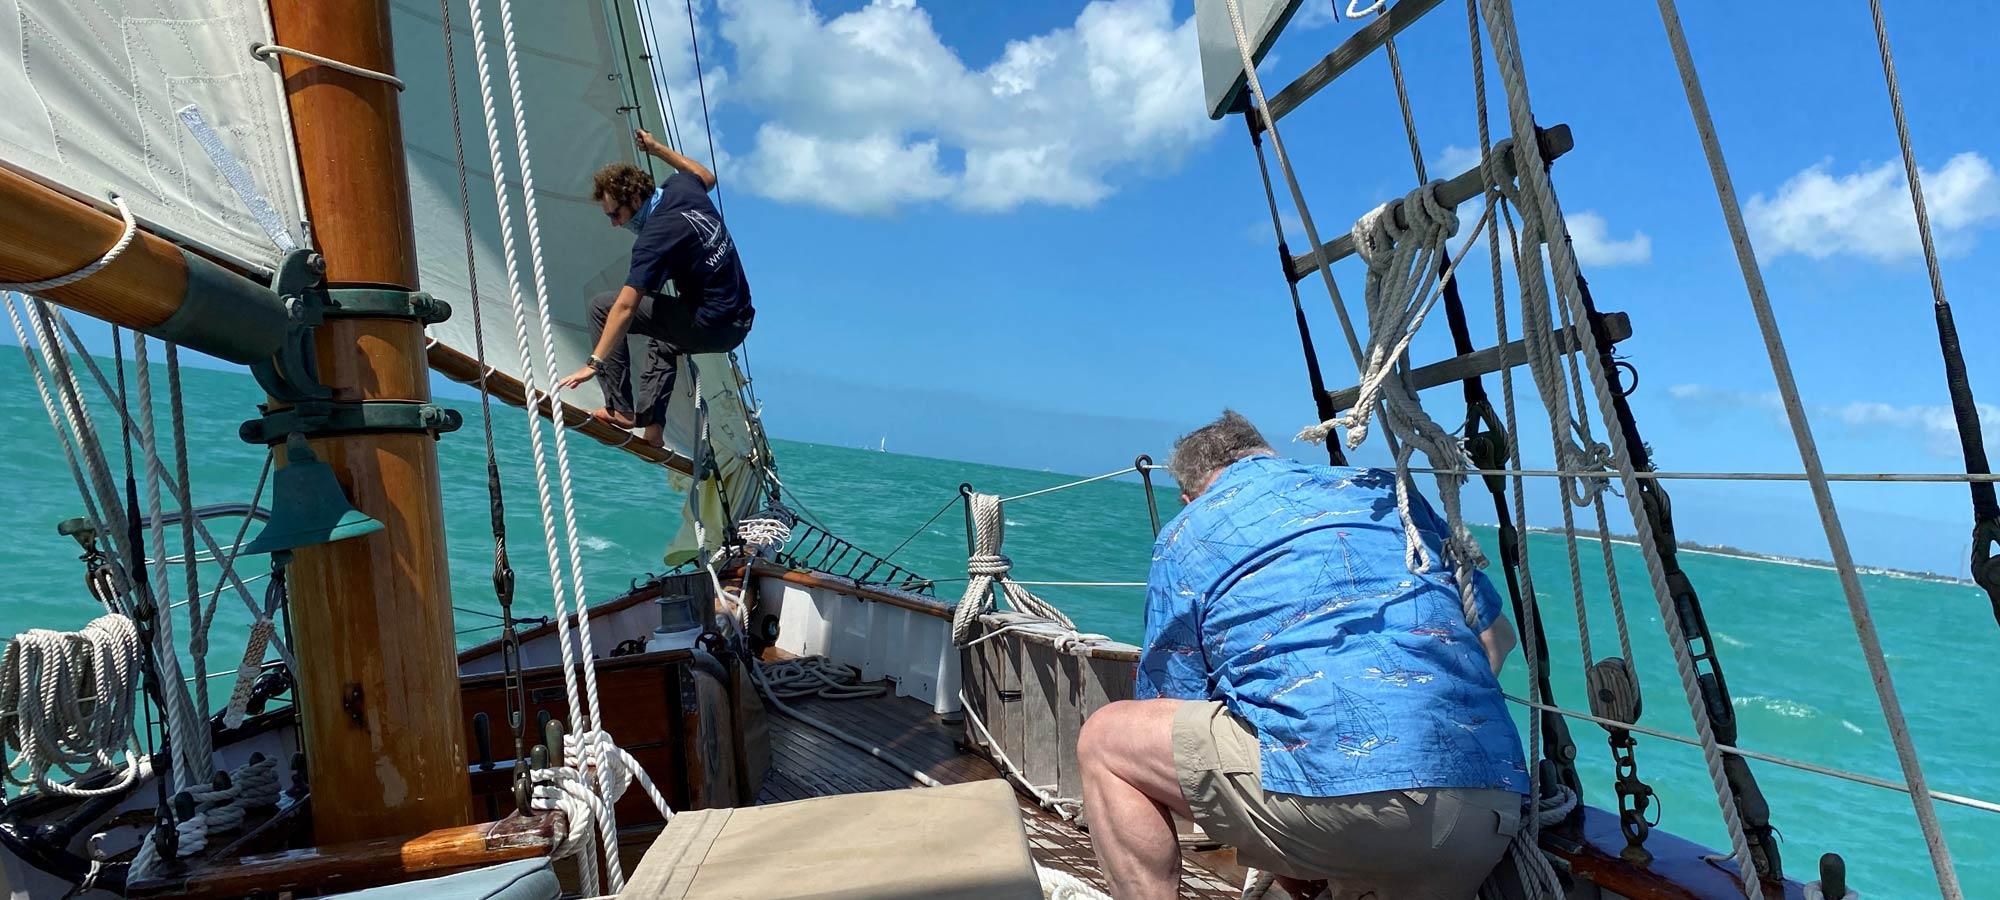 shared language sailboat